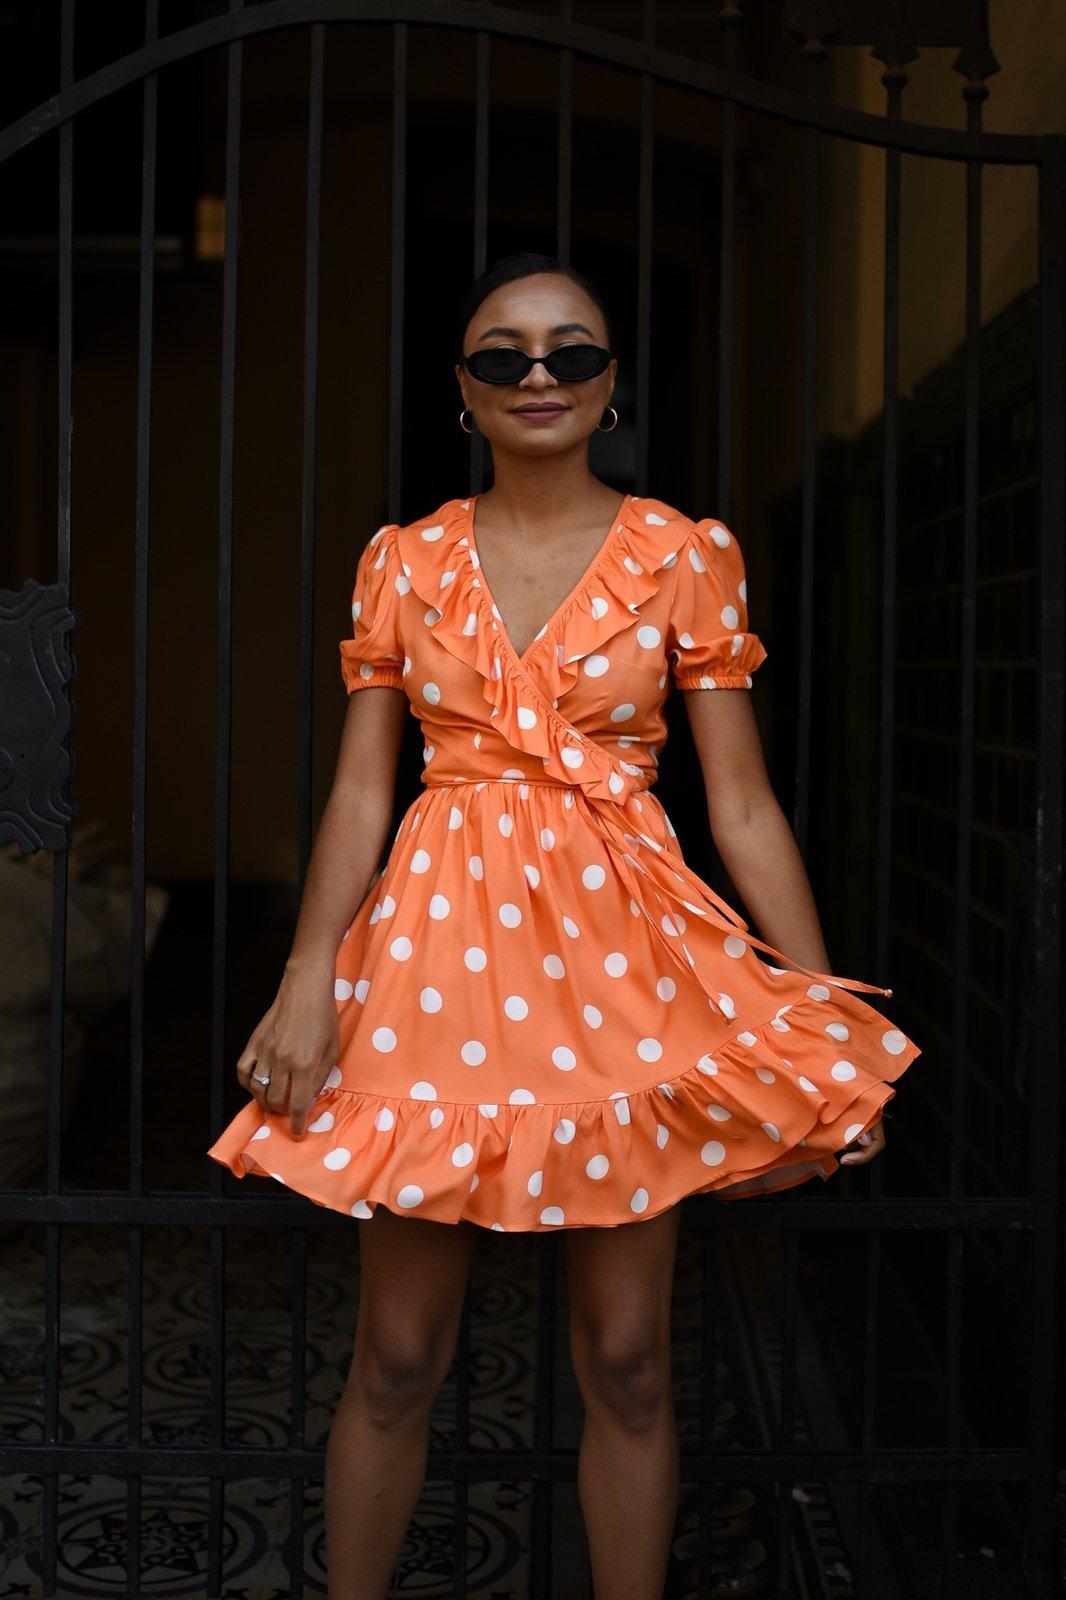 CHEAP Yasmine White Dots Dress 28617023859 – Women's Dresses & Skirts